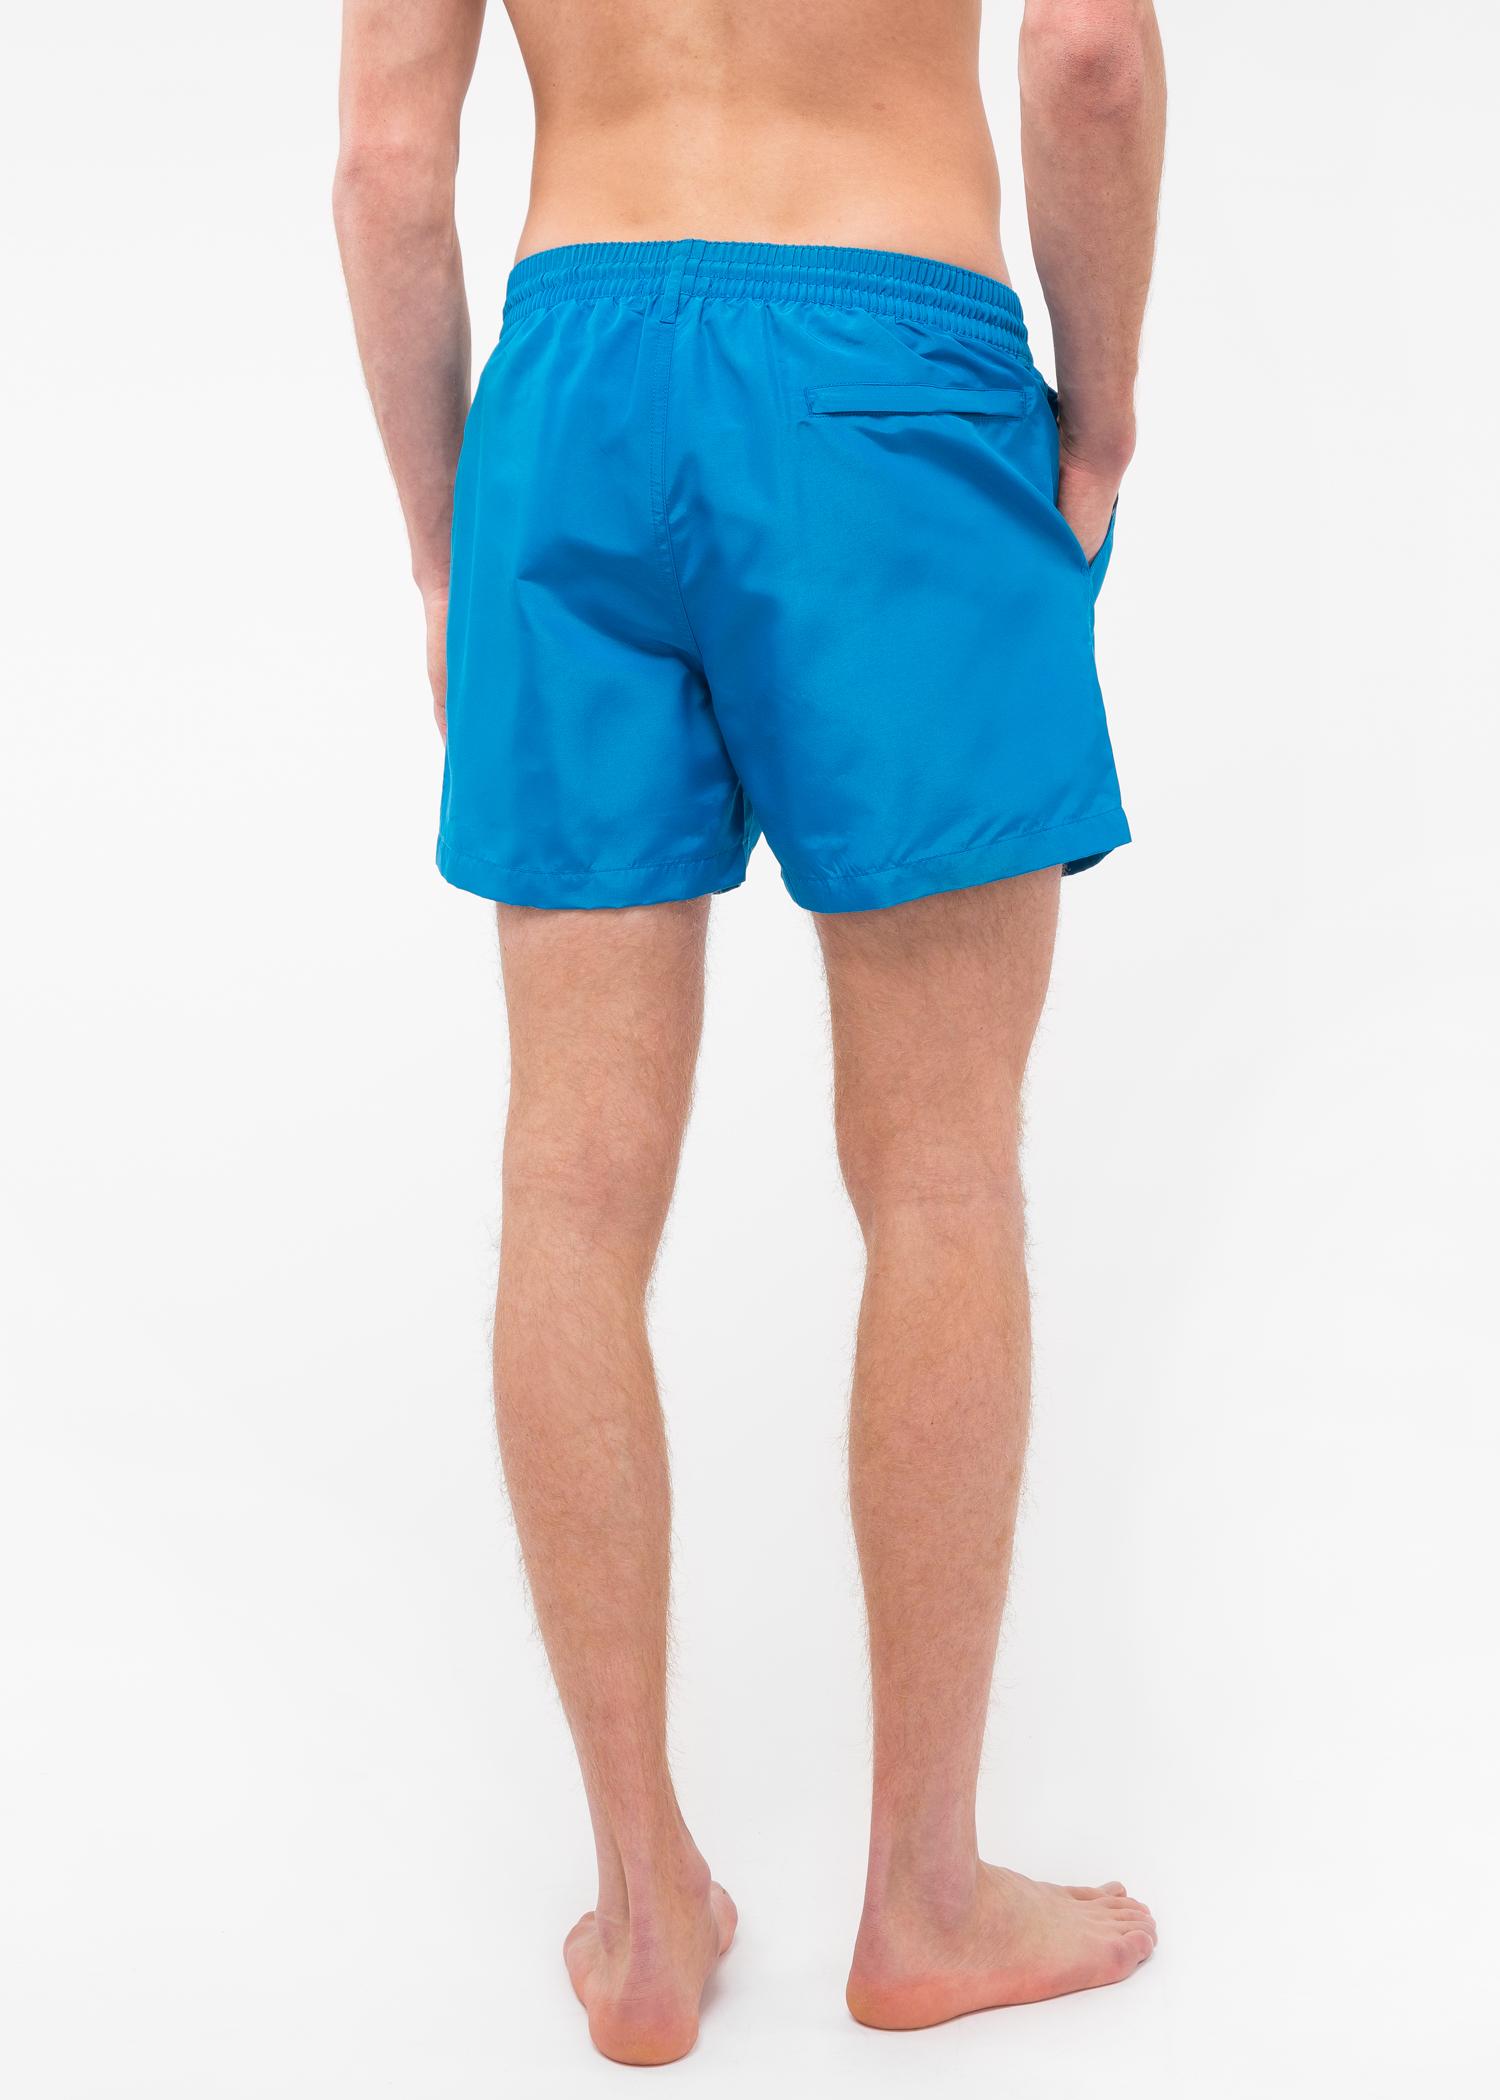 15a481ded9 Men's Sky Blue Swim Shorts - Paul Smith Denmark